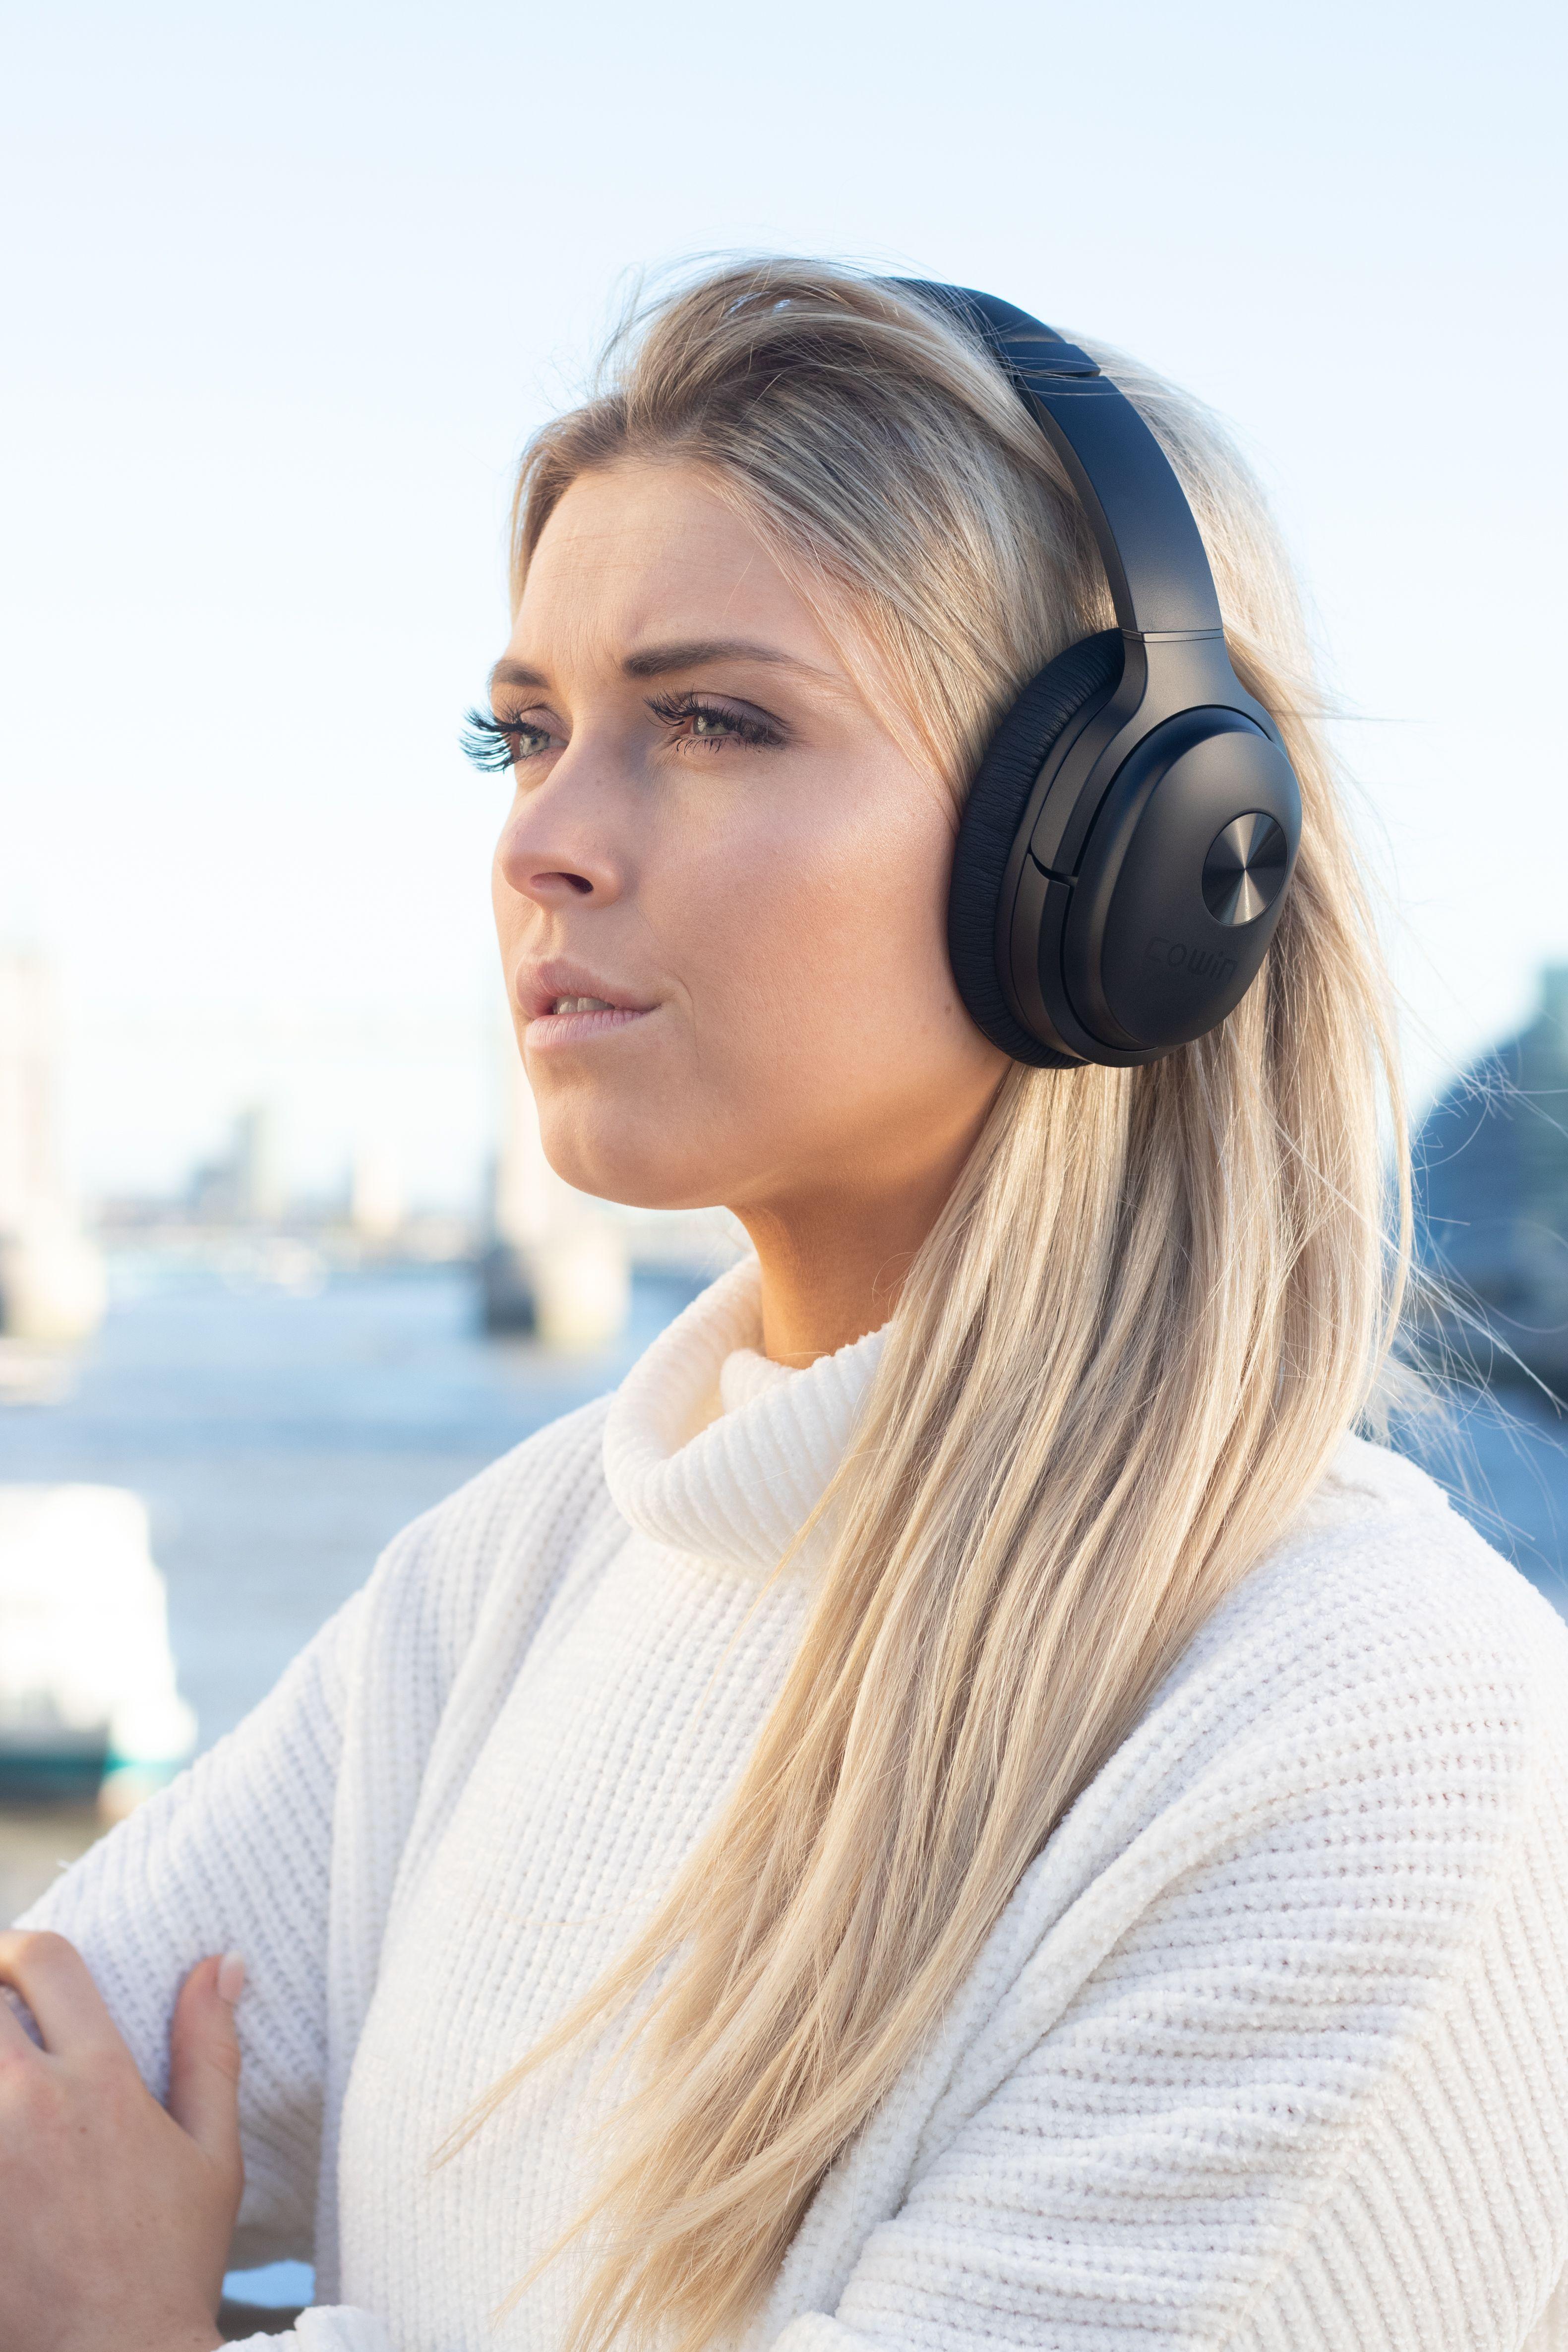 Se7 Foldable Active Noise Cancelling Bluetooth Headphones Active Noise Cancellation Noise Cancelling Headphones